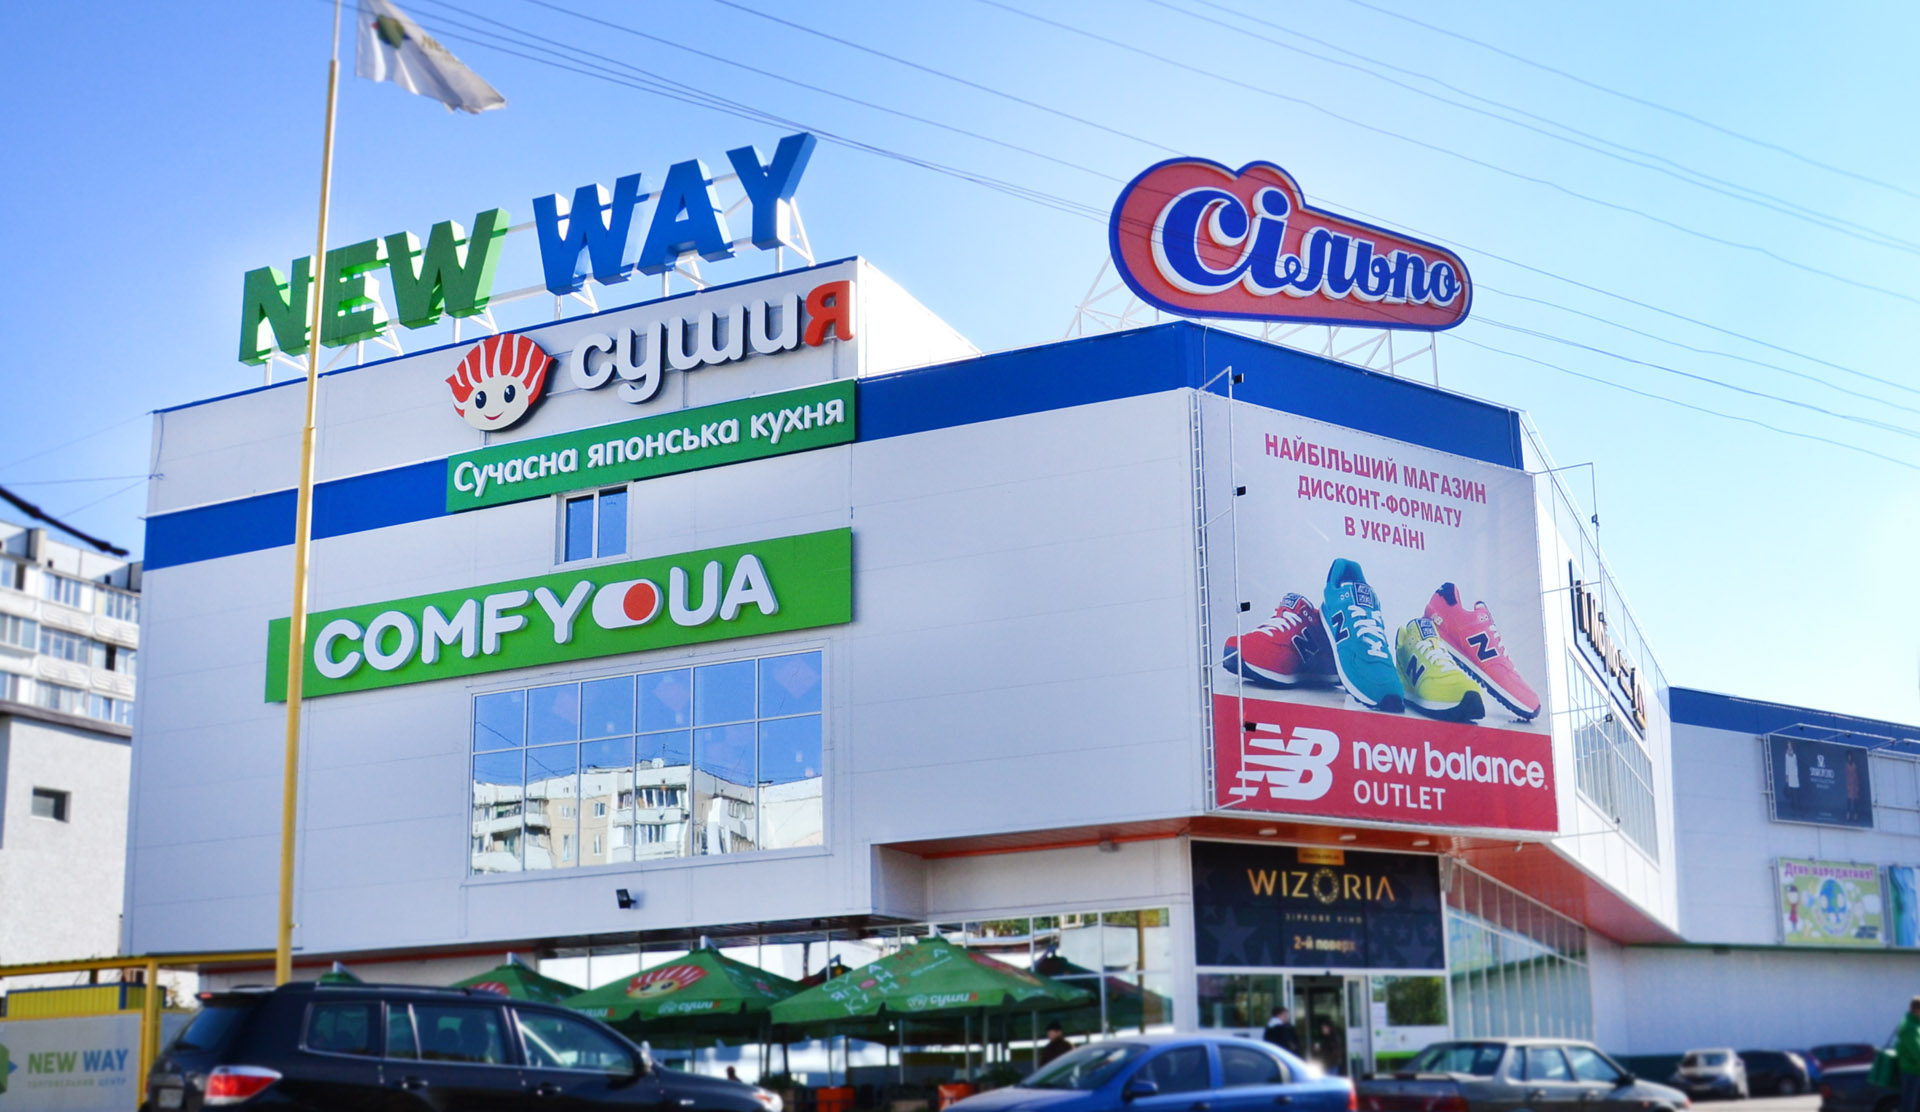 Дизайн логотипа of the shopping center, Shopping mall logo design